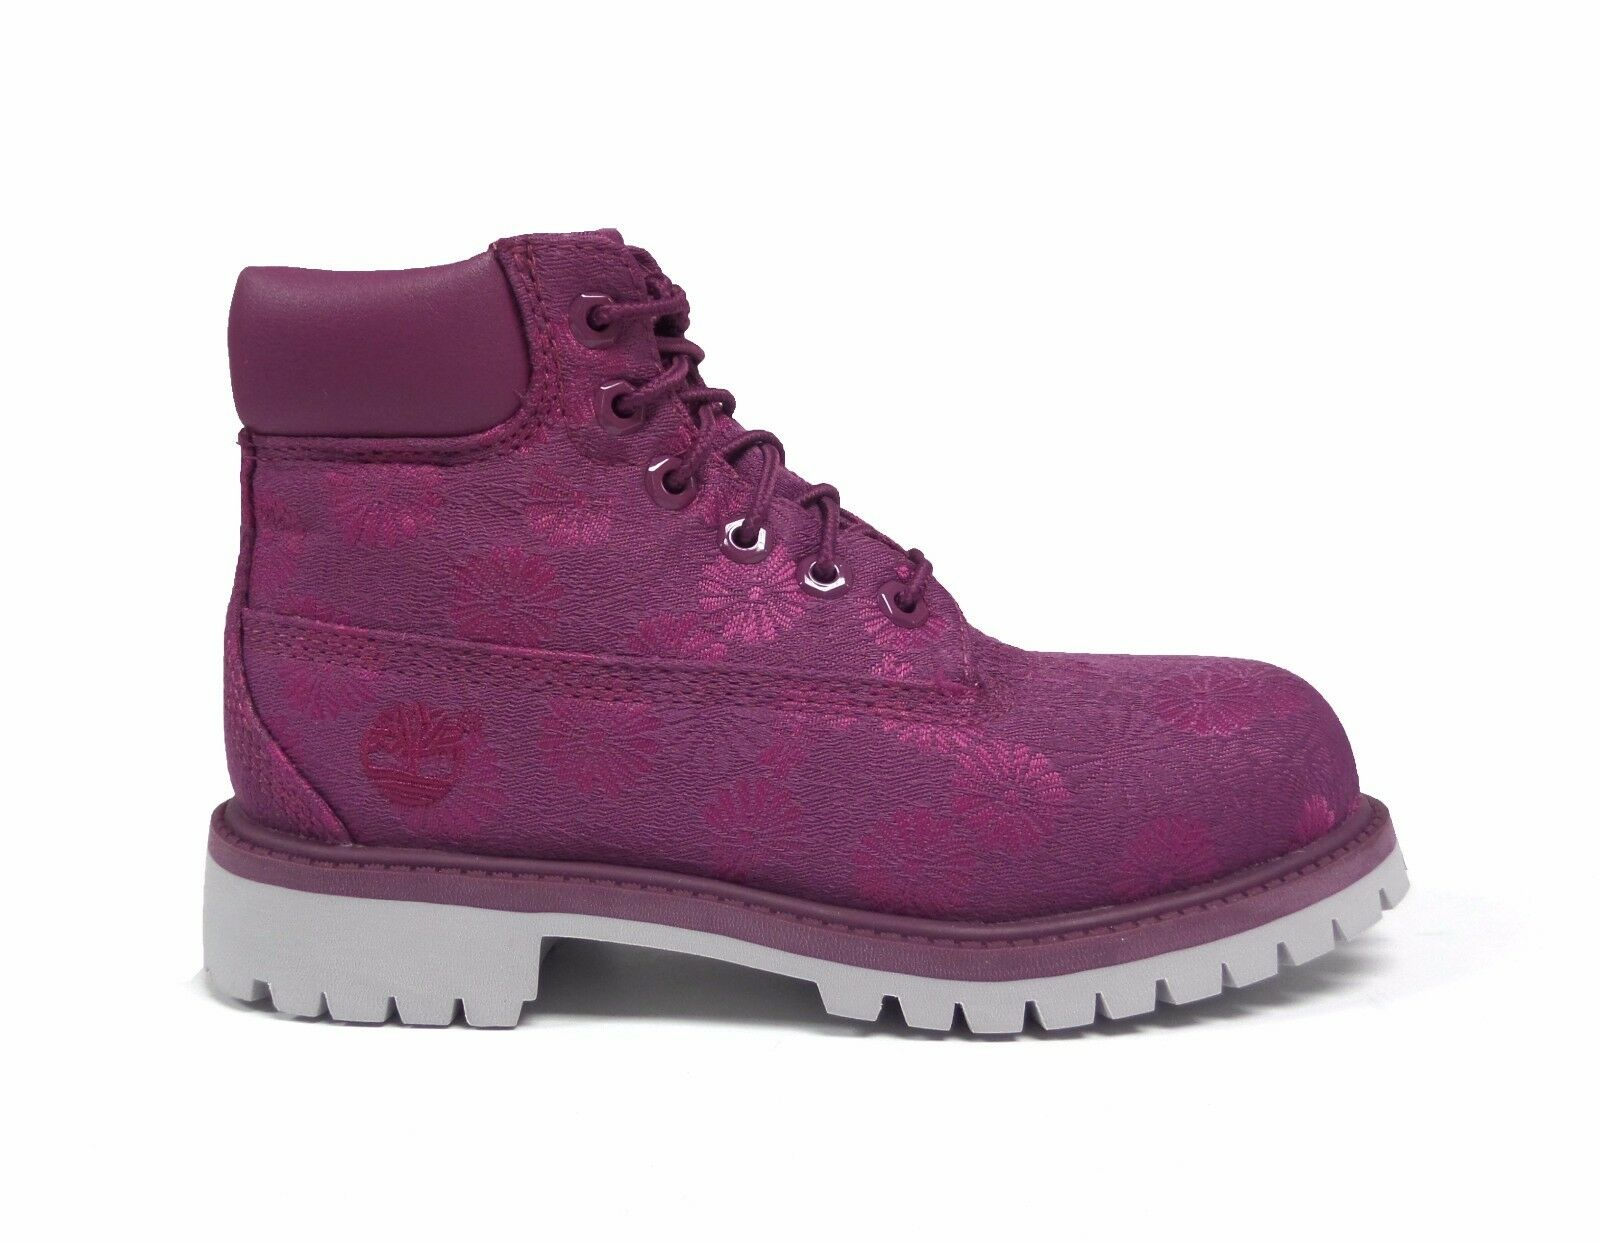 50dd3f6ad21 Tb0a197d524-510 Timberland Kids Girls 6 in Premium Waterproof Fabric Boot  13.5 Little Kid M Magenta Purple Floral Jacquard